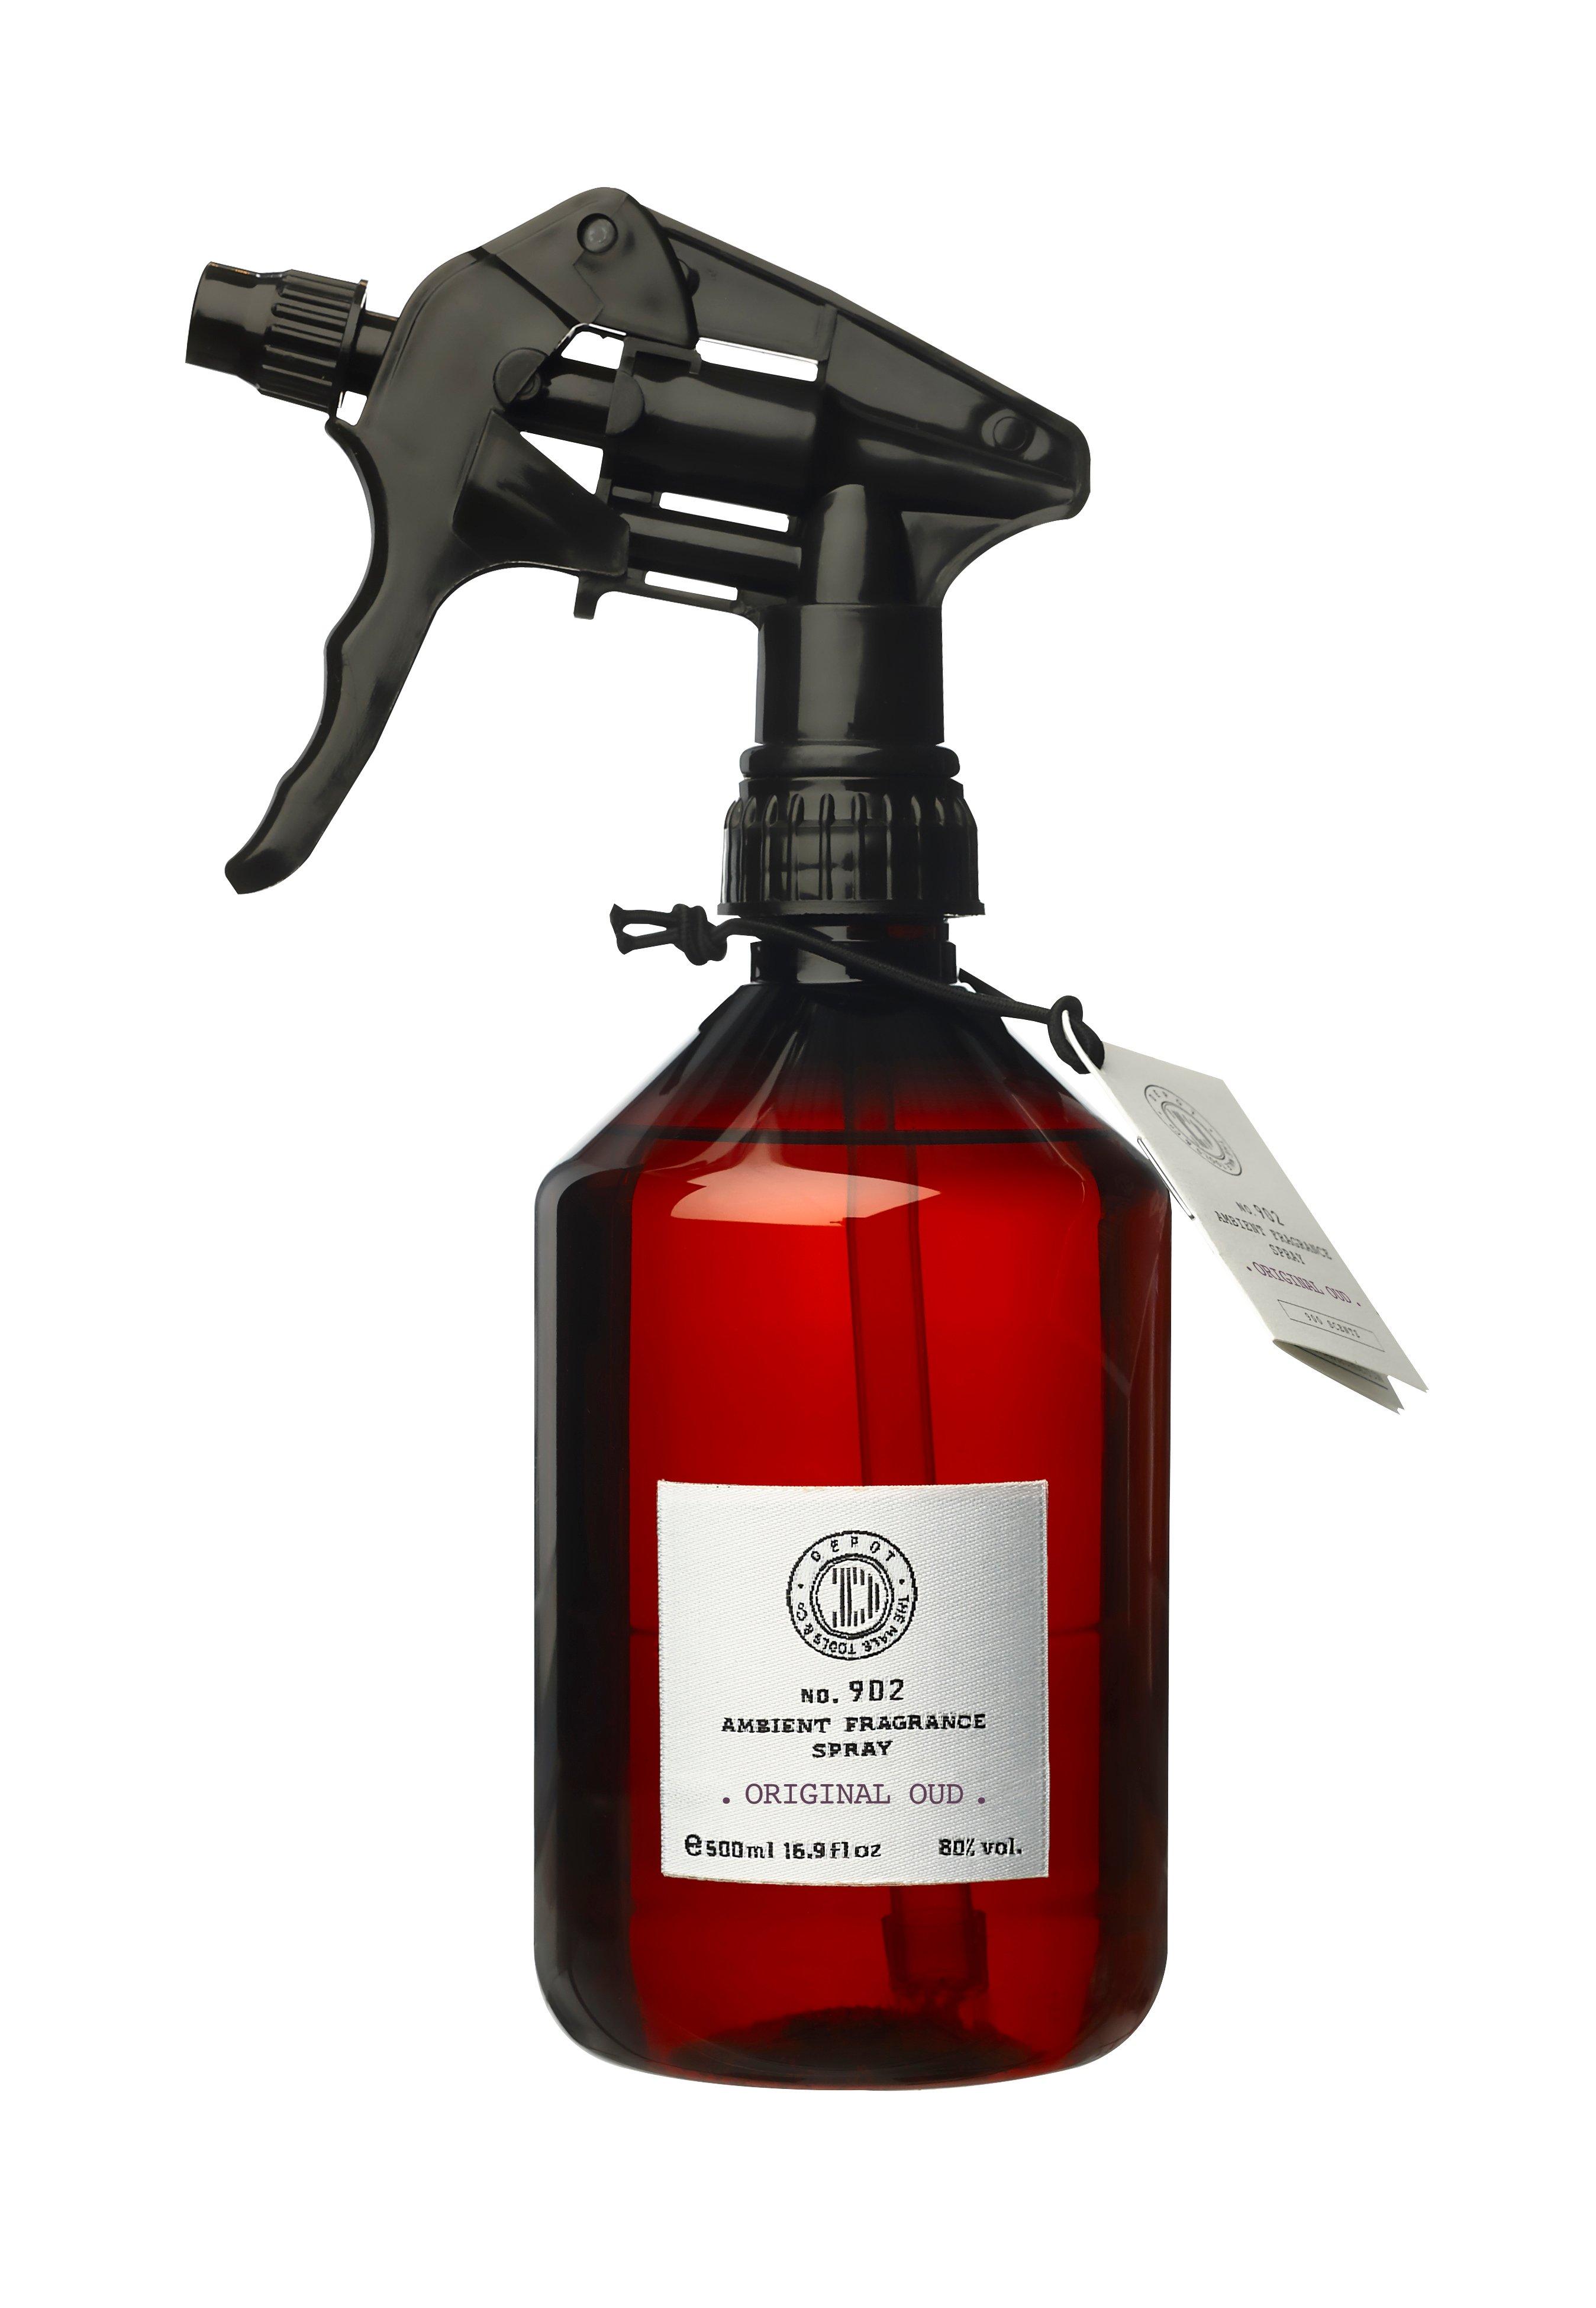 Depot - No. 902 Ambient Fragrance Spray - Original Oud